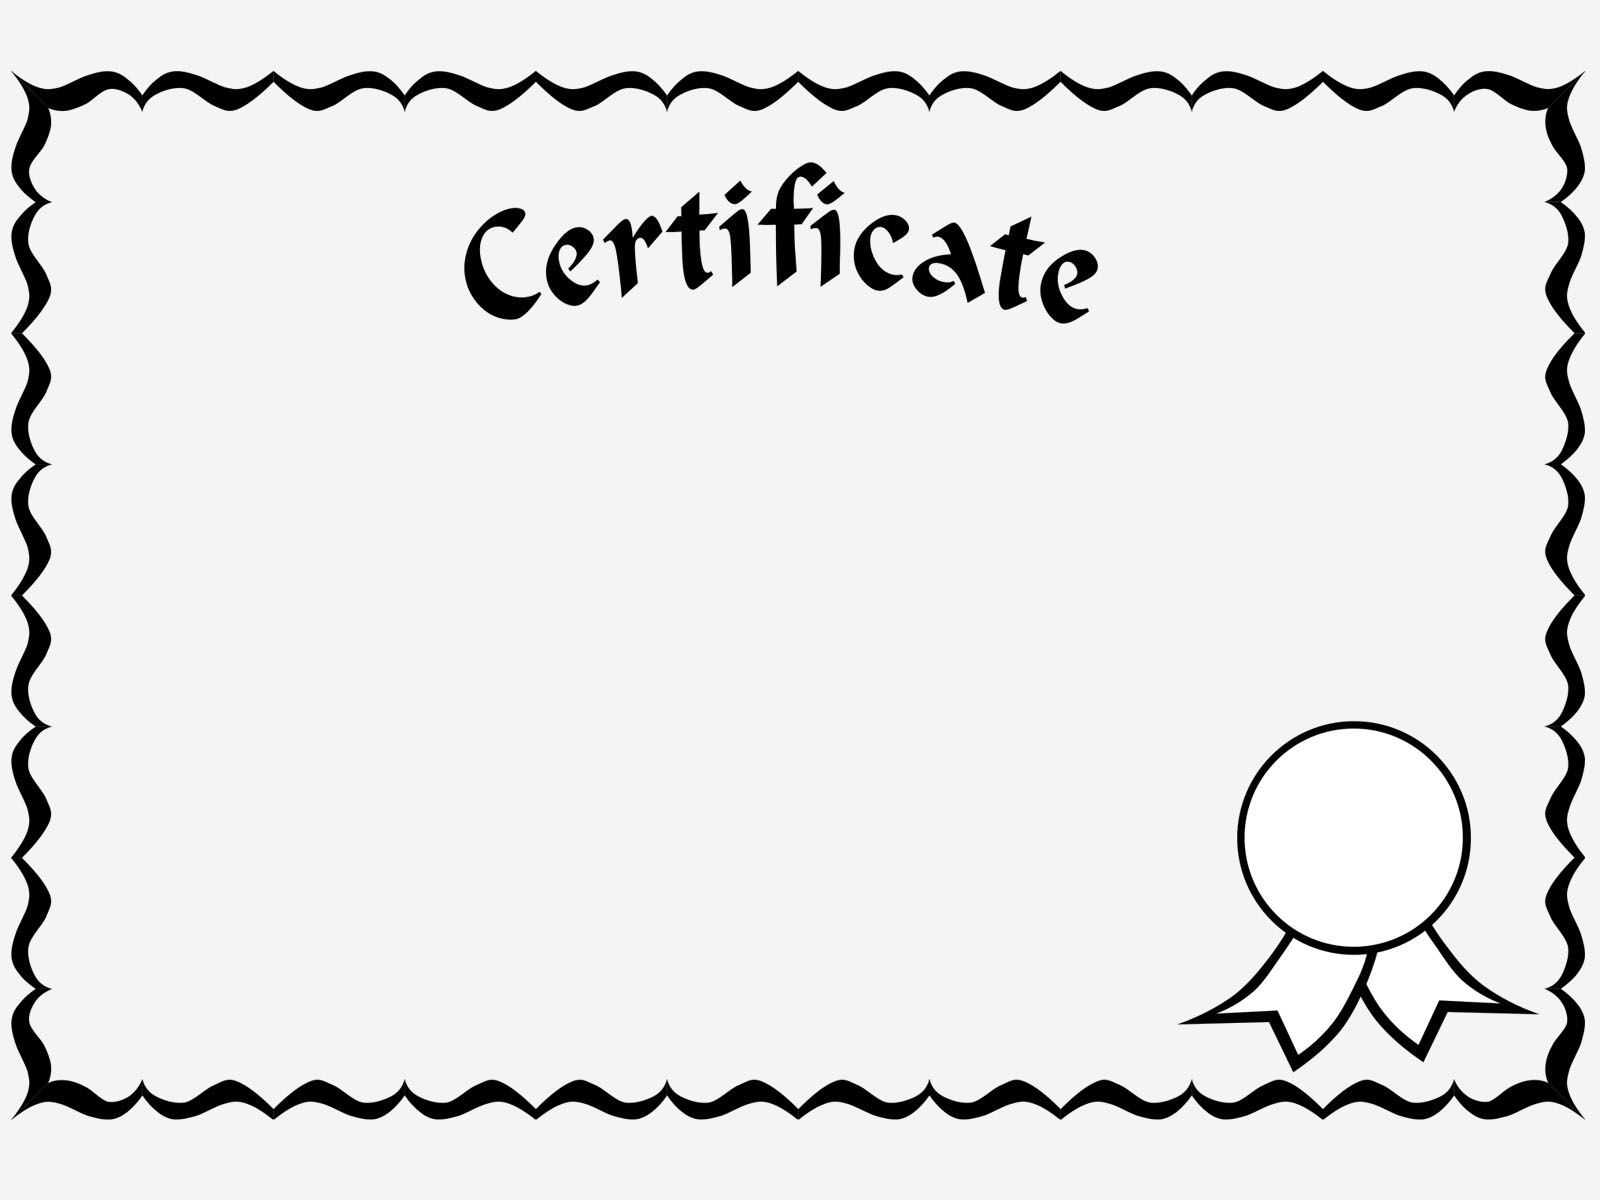 powerpoint award certificate border templates .